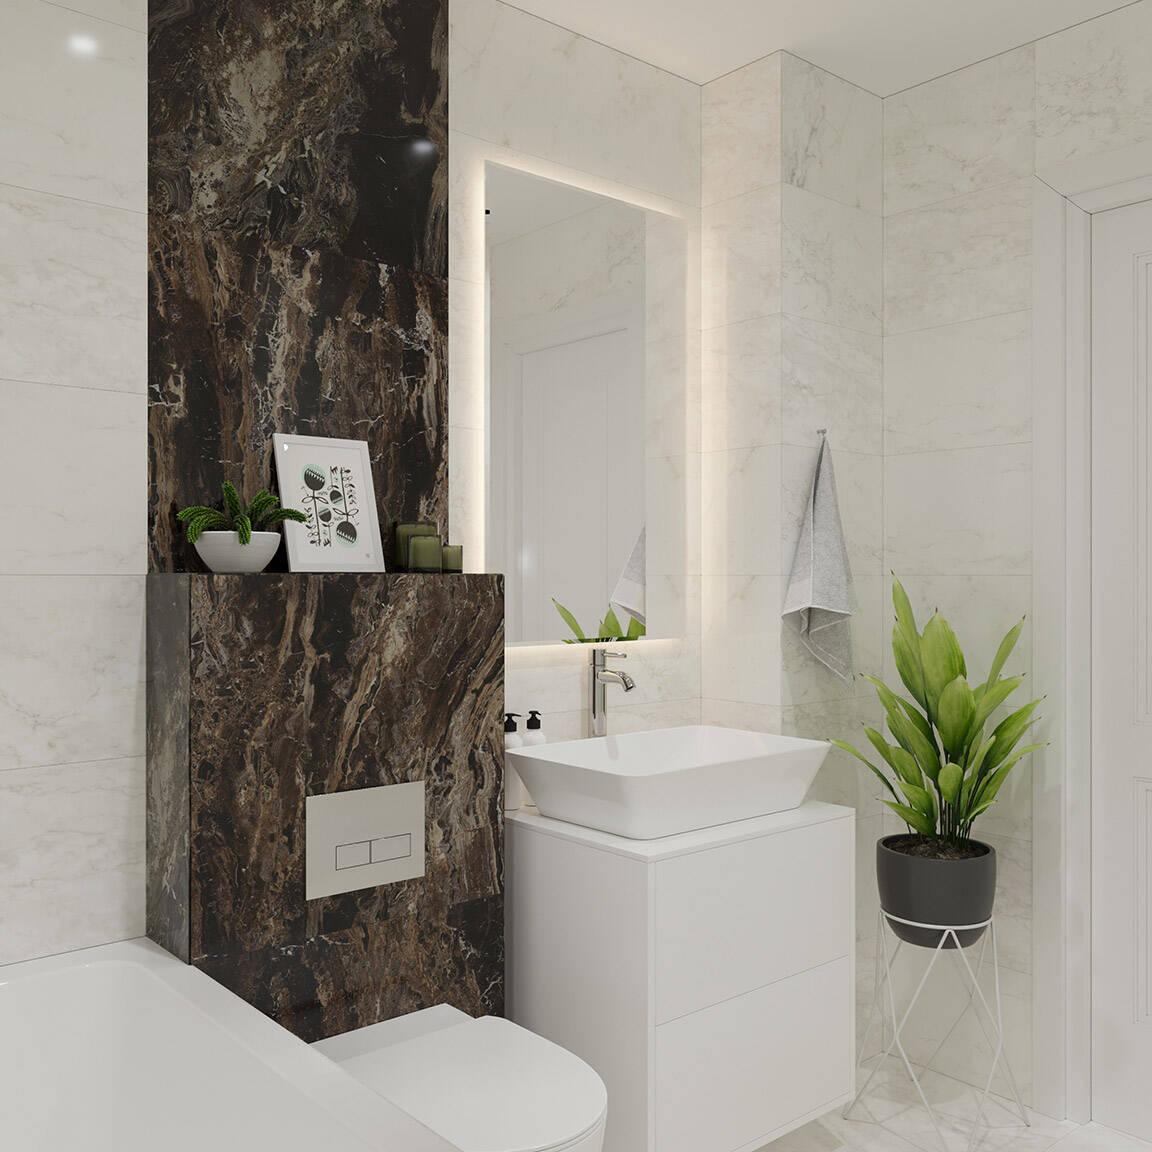 Catedral Residence - Bathroom - Marazzi Ceramic tiles - 2